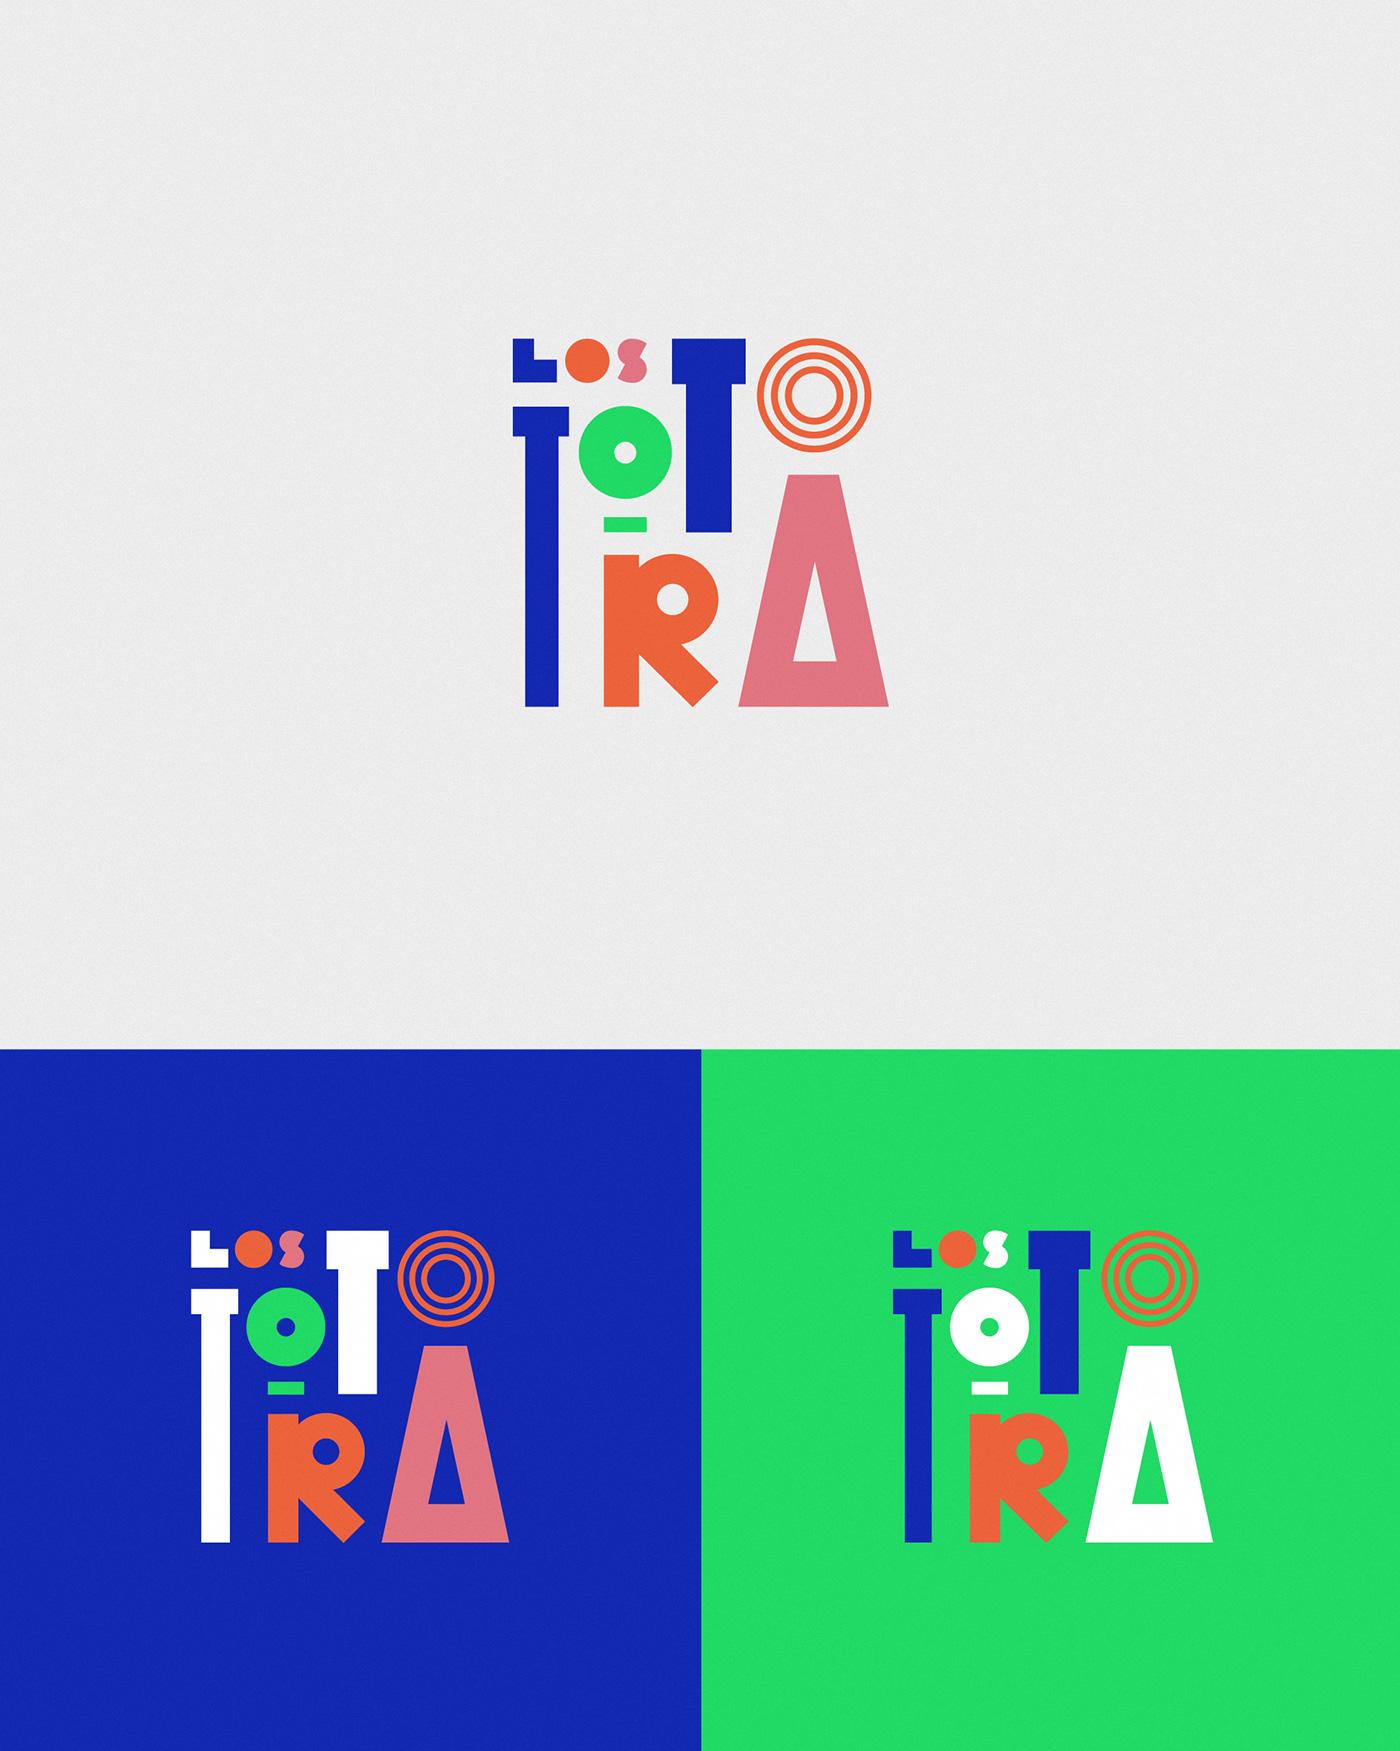 pop music band Show visuals ads shapes cumbia